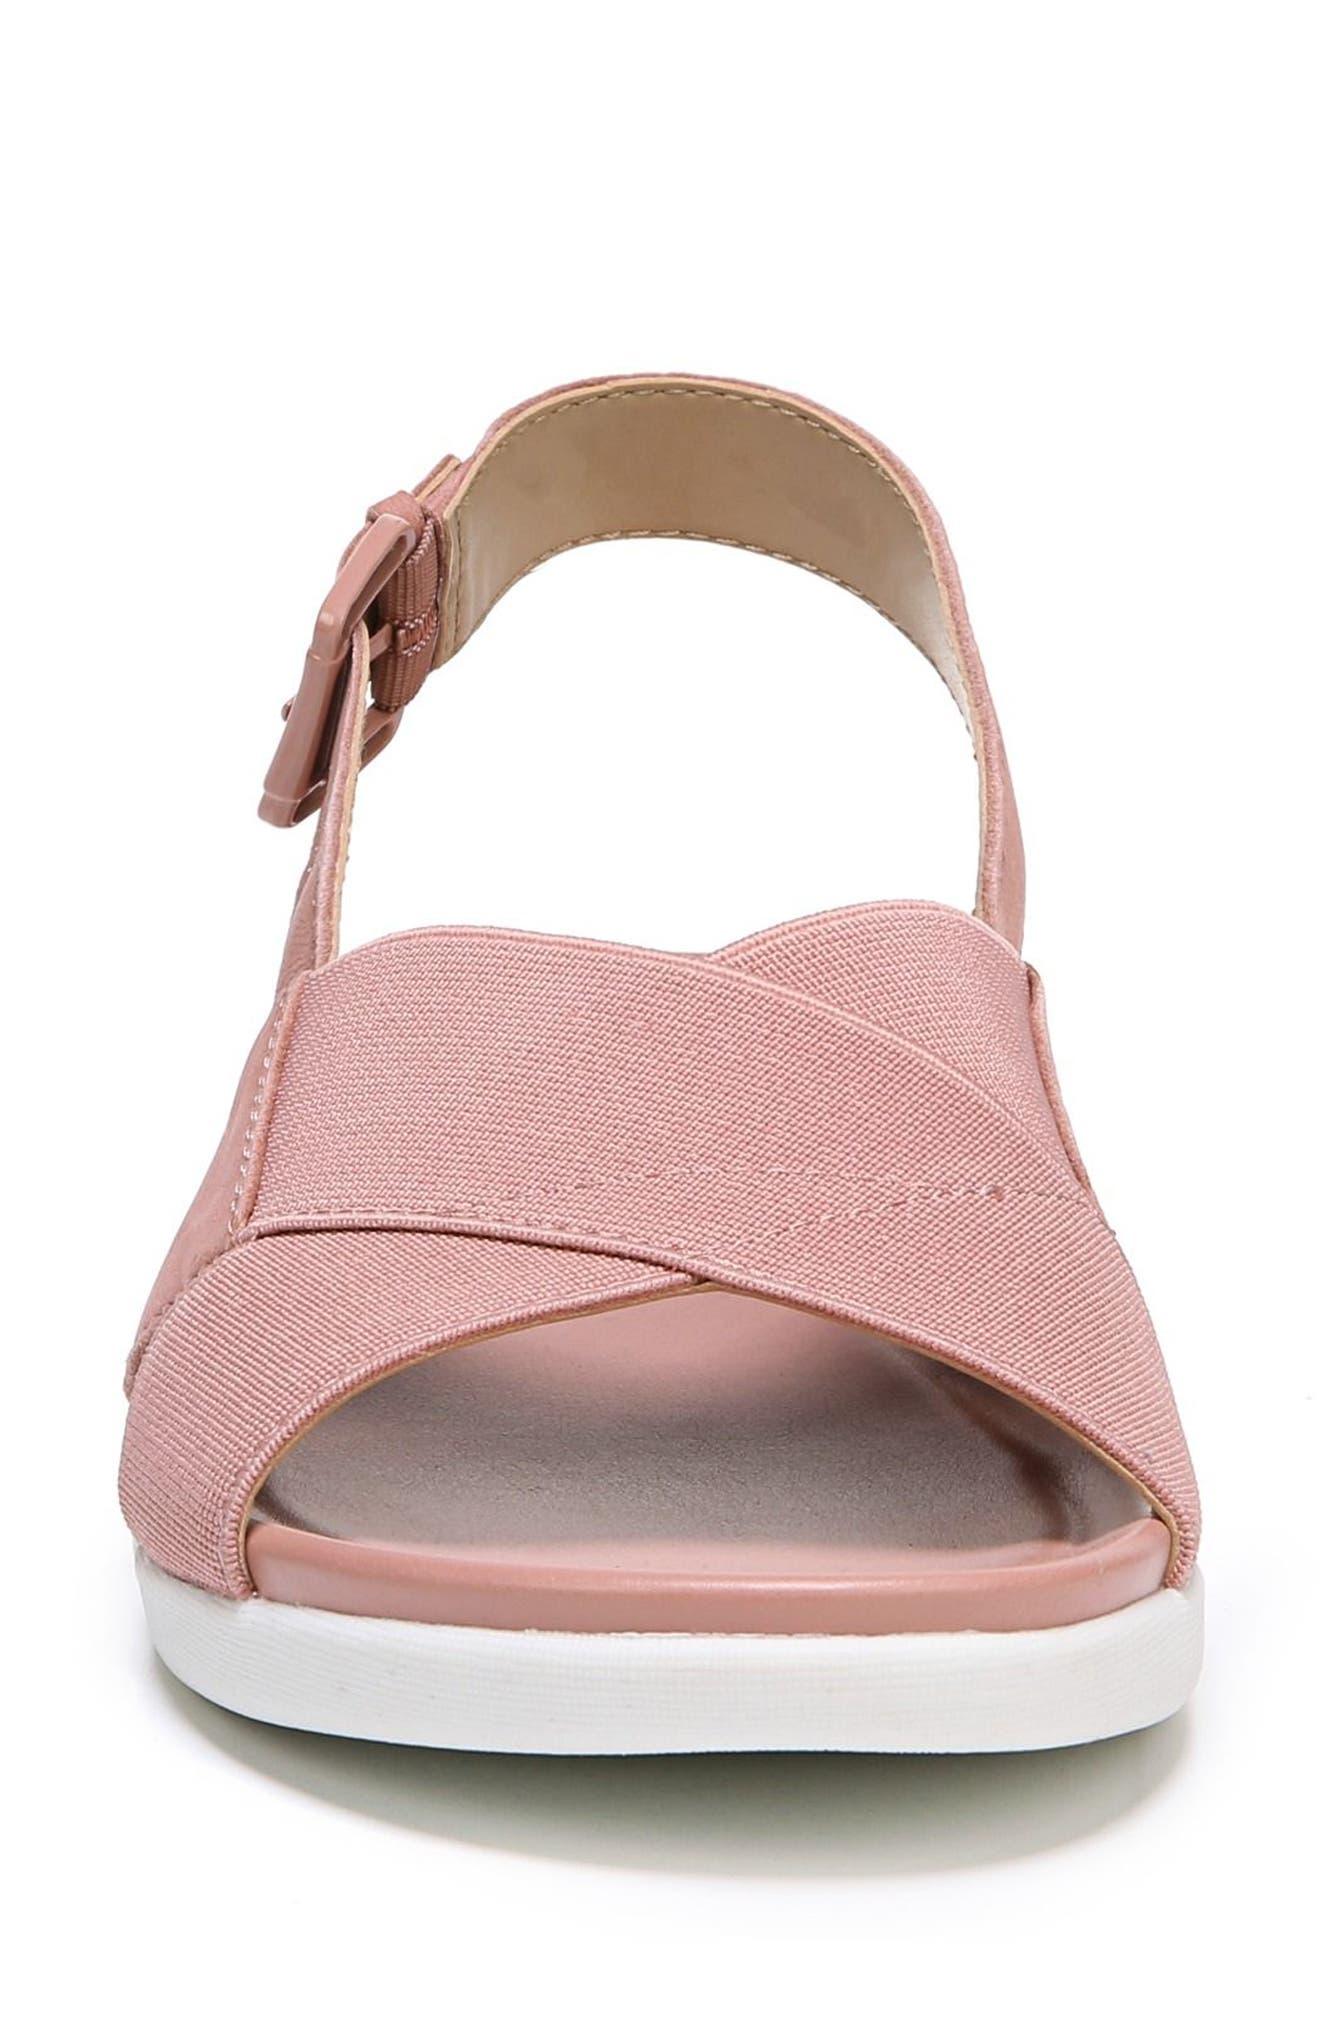 Eliza Wedge Sandal,                             Alternate thumbnail 4, color,                             Pink Nubuck Leather